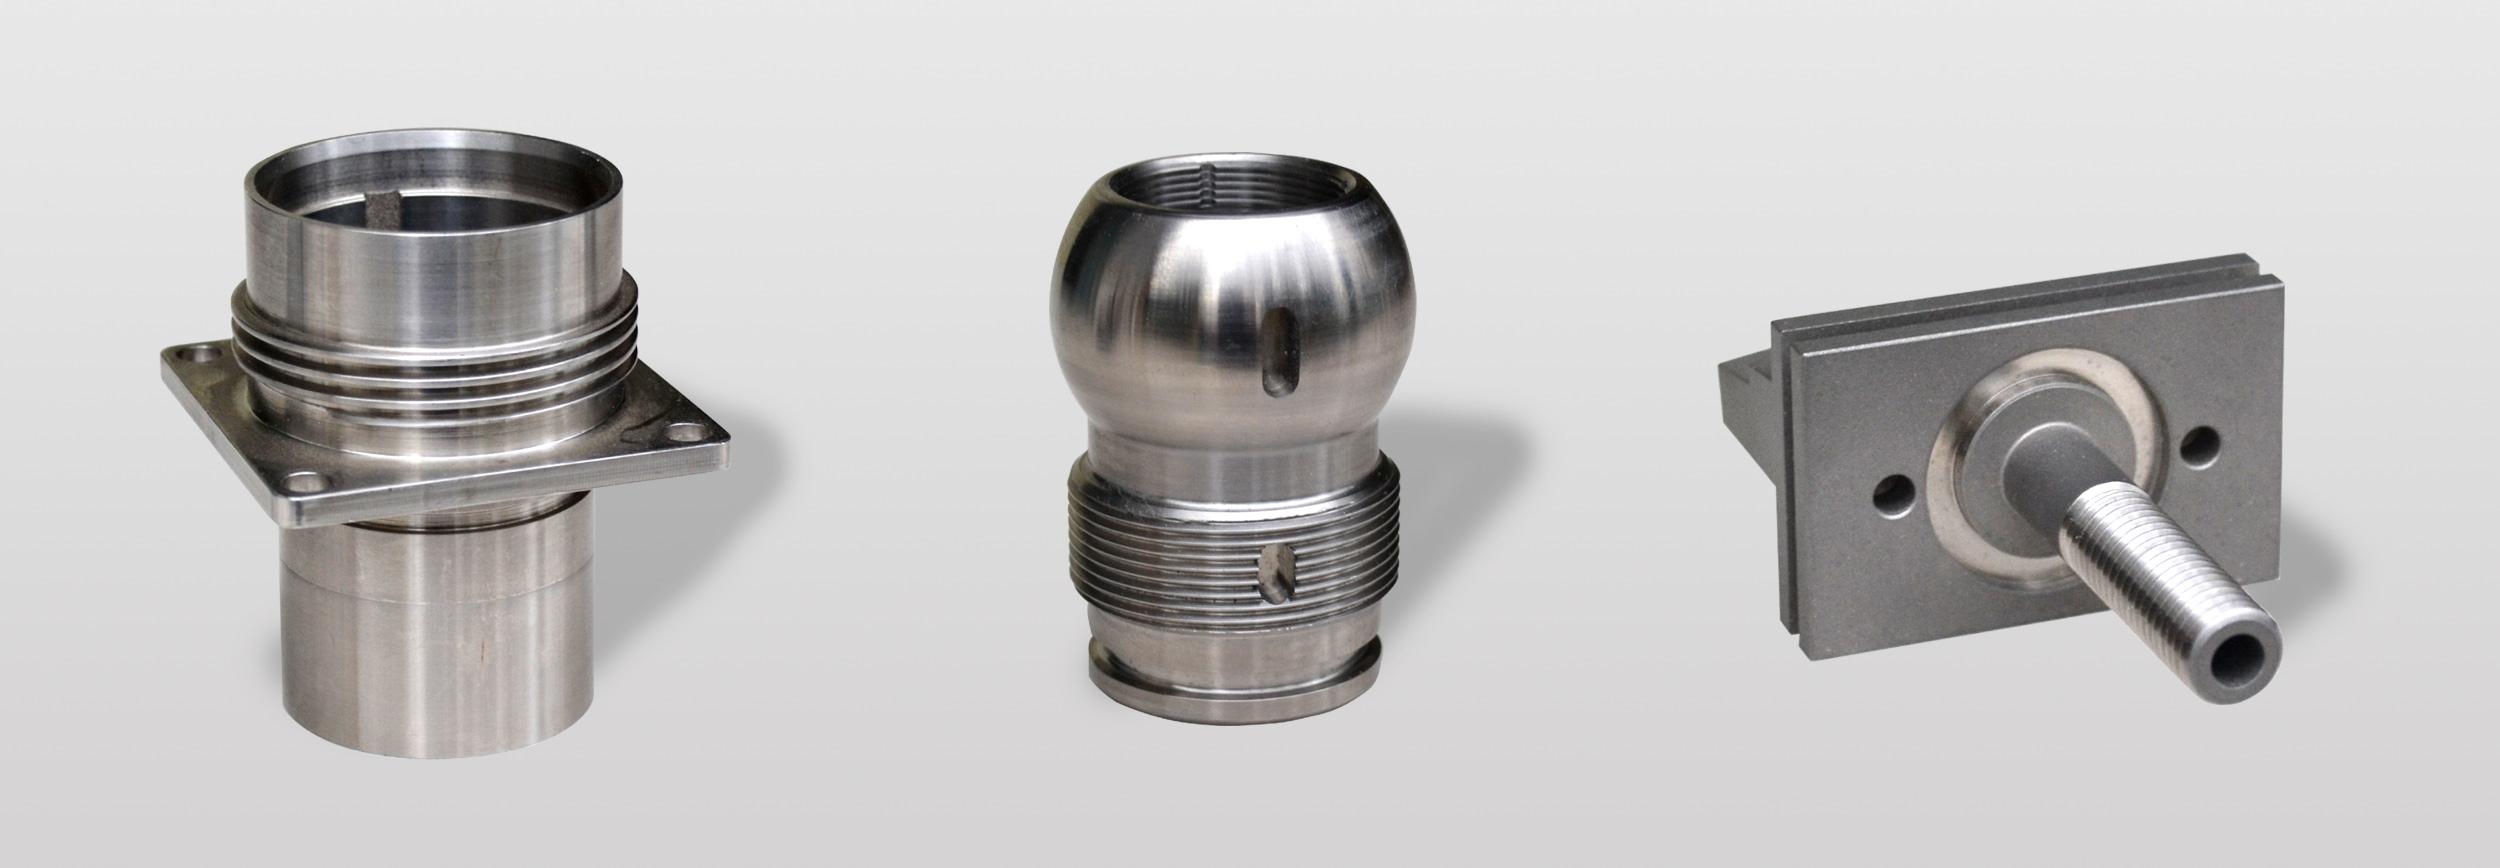 Custom machining components